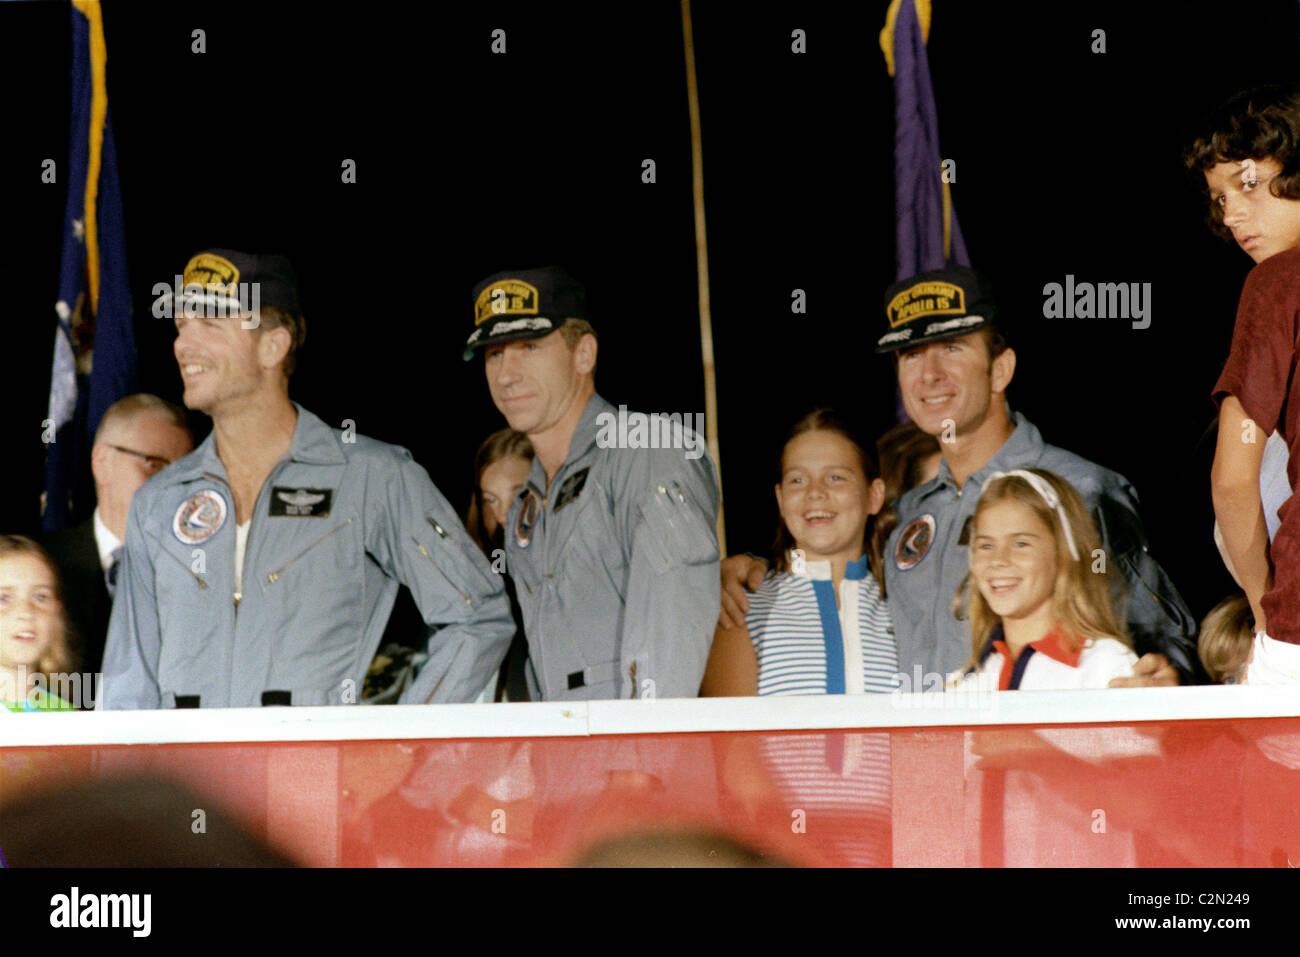 Apollo 15 Crew and Family Members - Stock Image